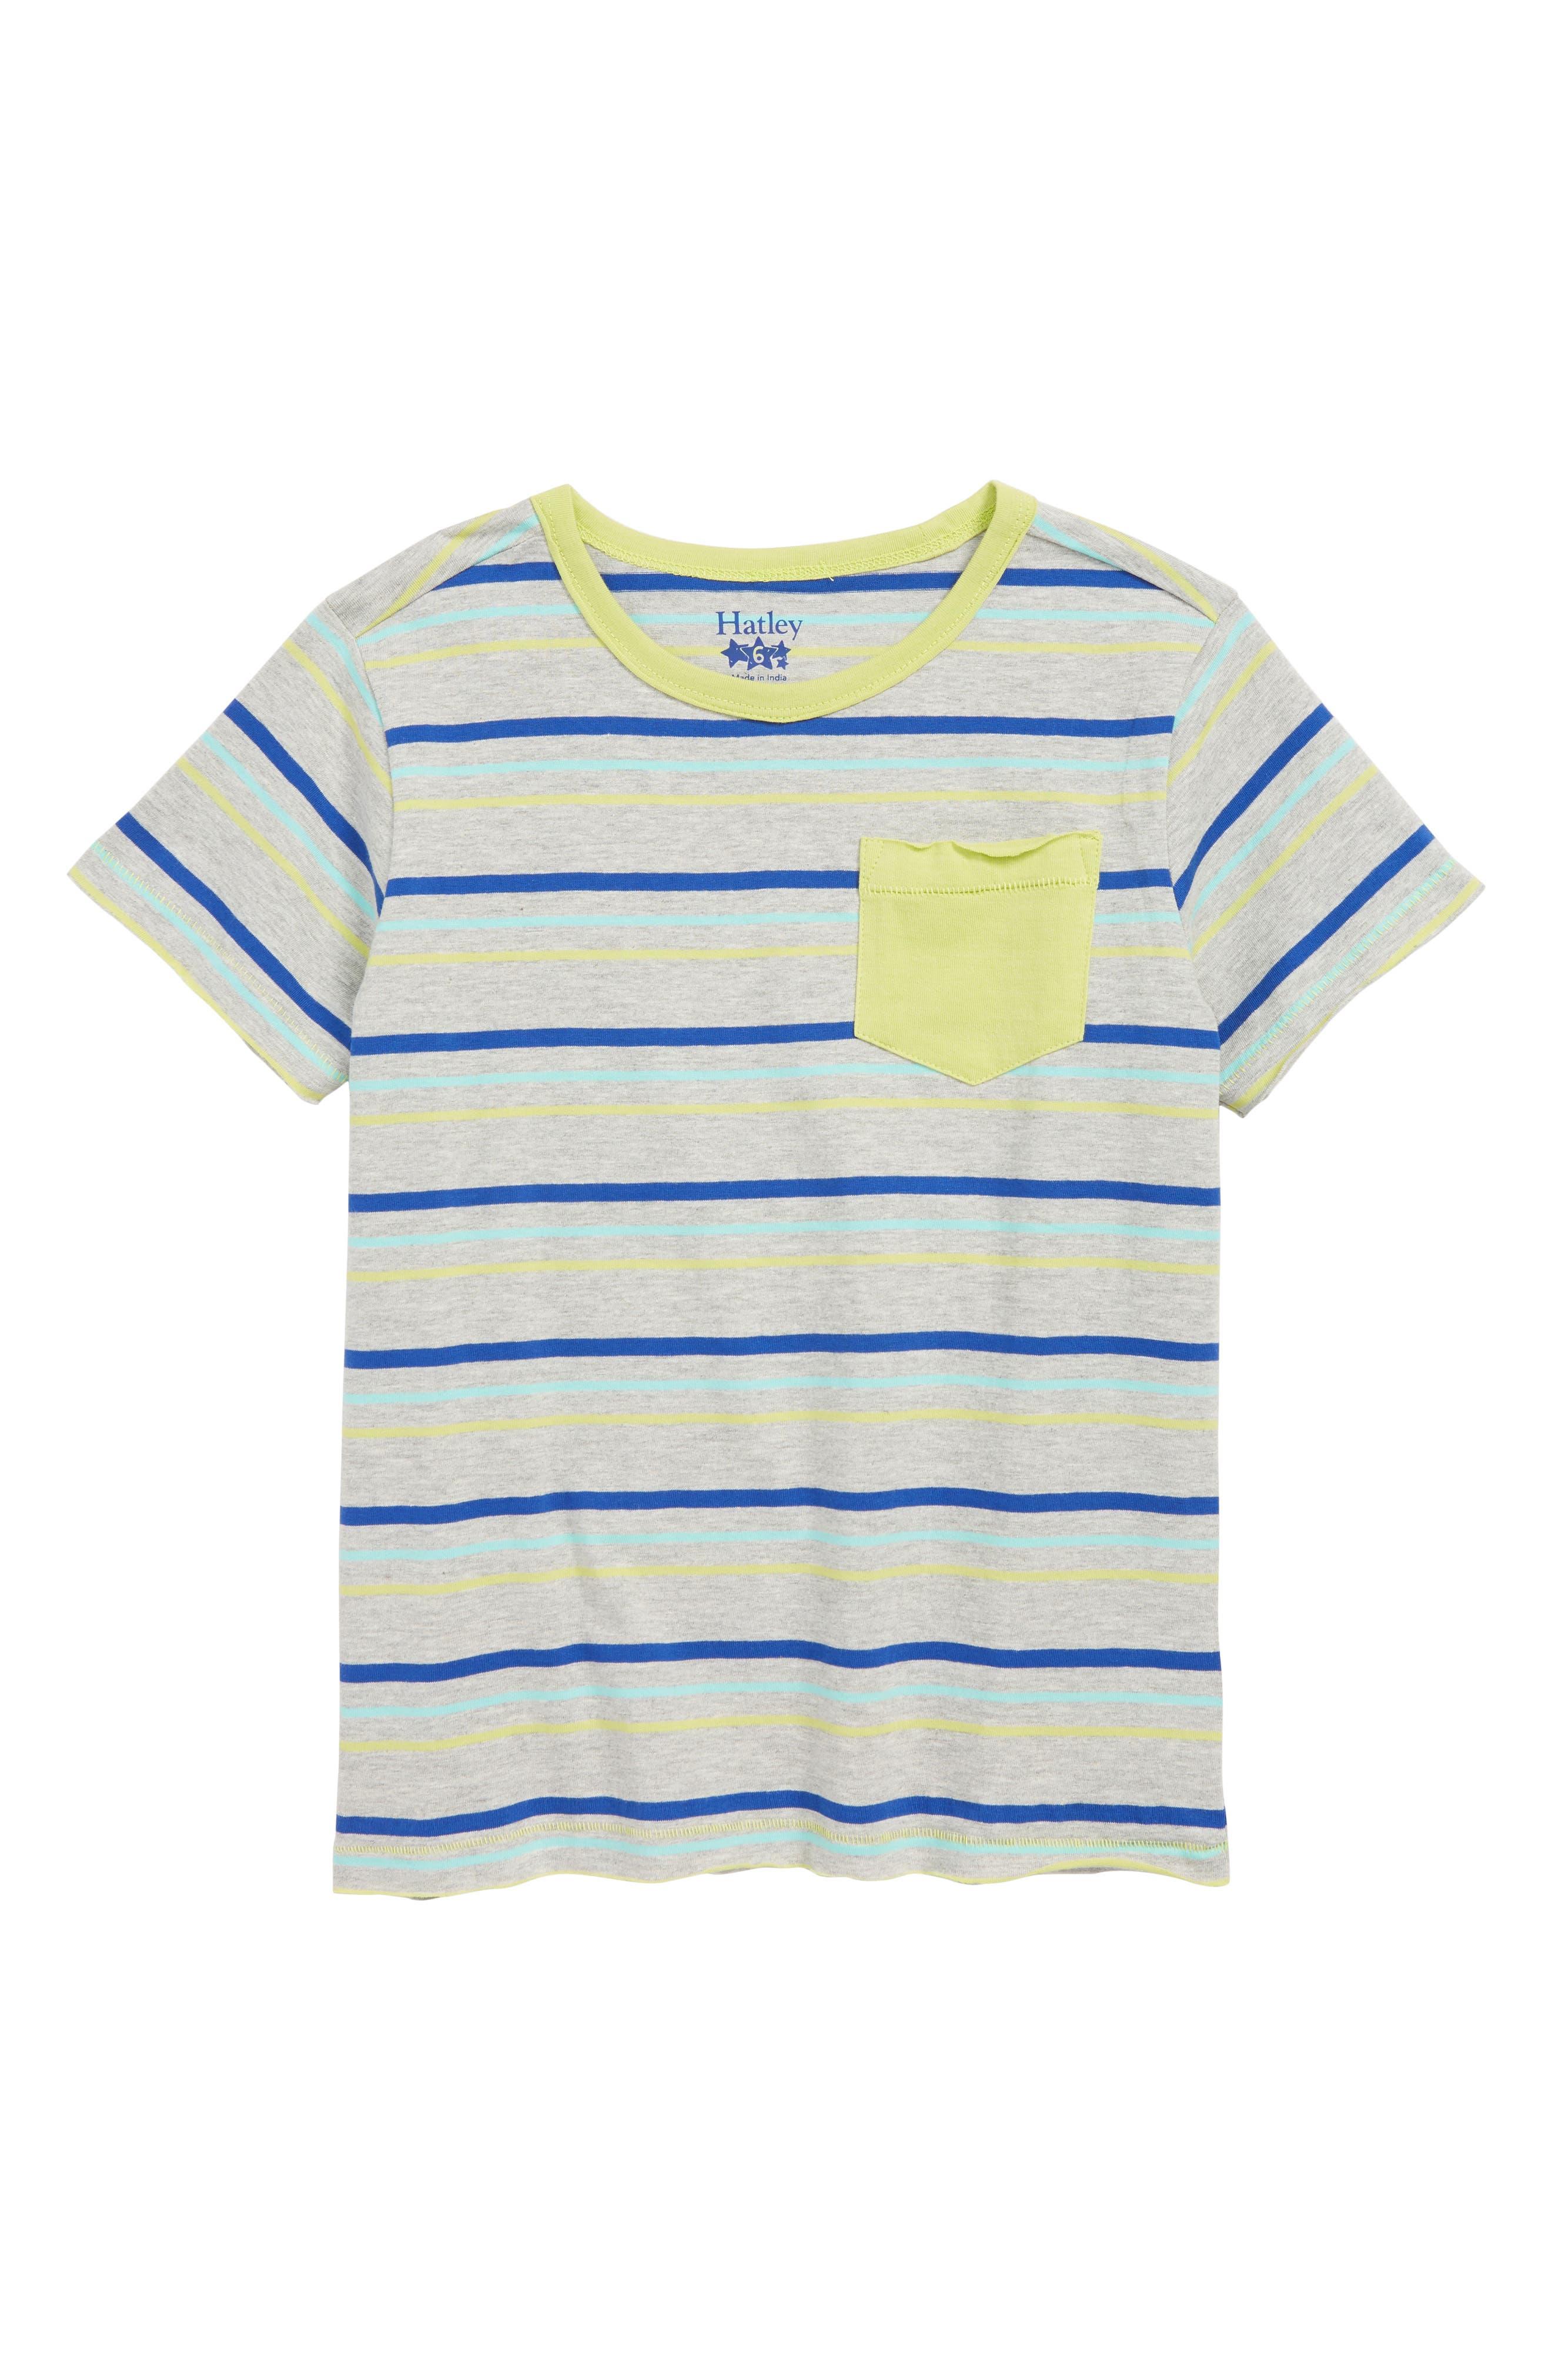 HATLEY Stripes T-Shirt, Main, color, GREY